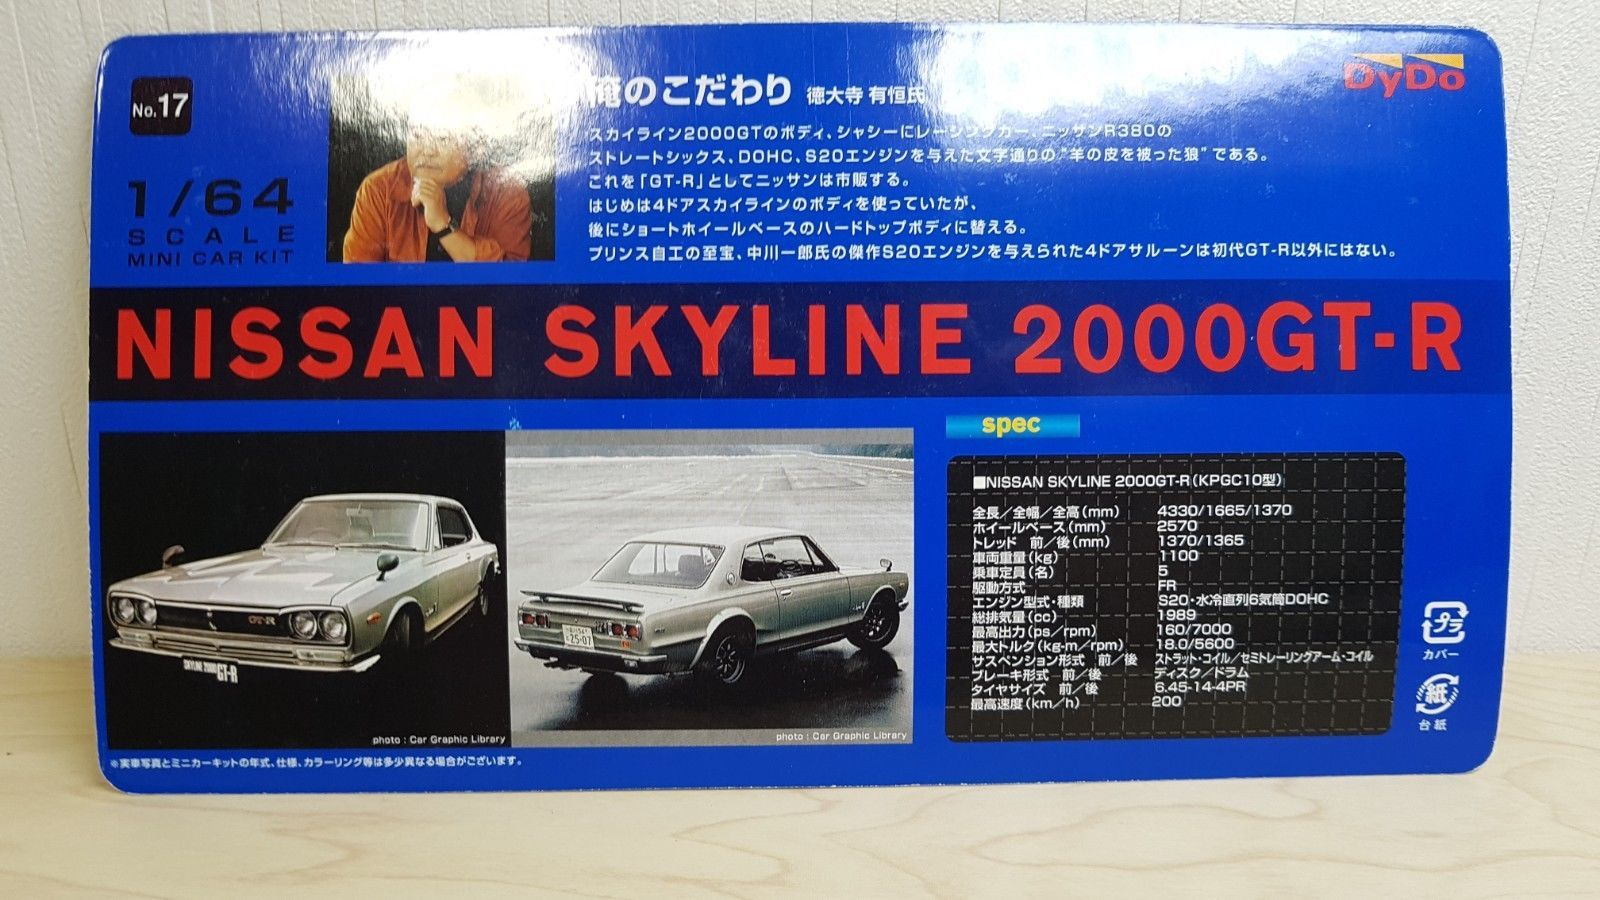 1/64 Konami Dydo NISSAN SKYLINE 2000 GT-R Hakosuka diecast car model kit